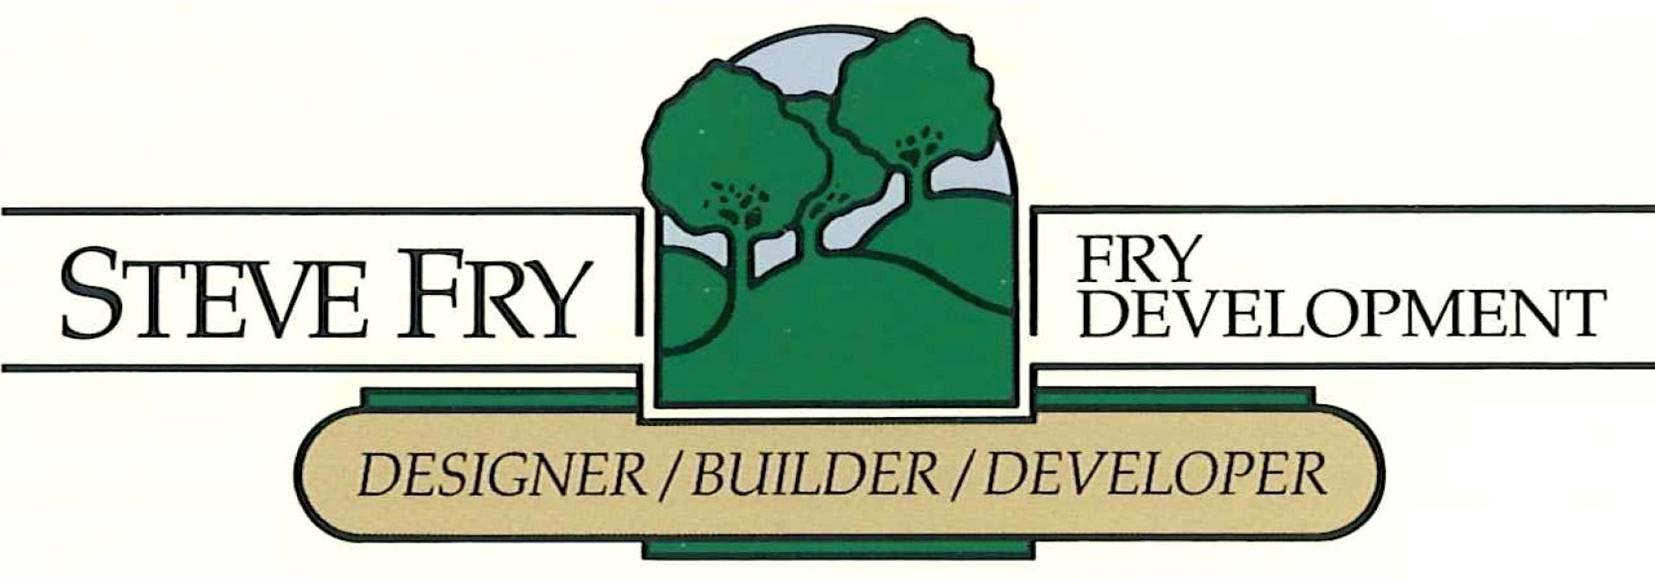 Steve Fry Development